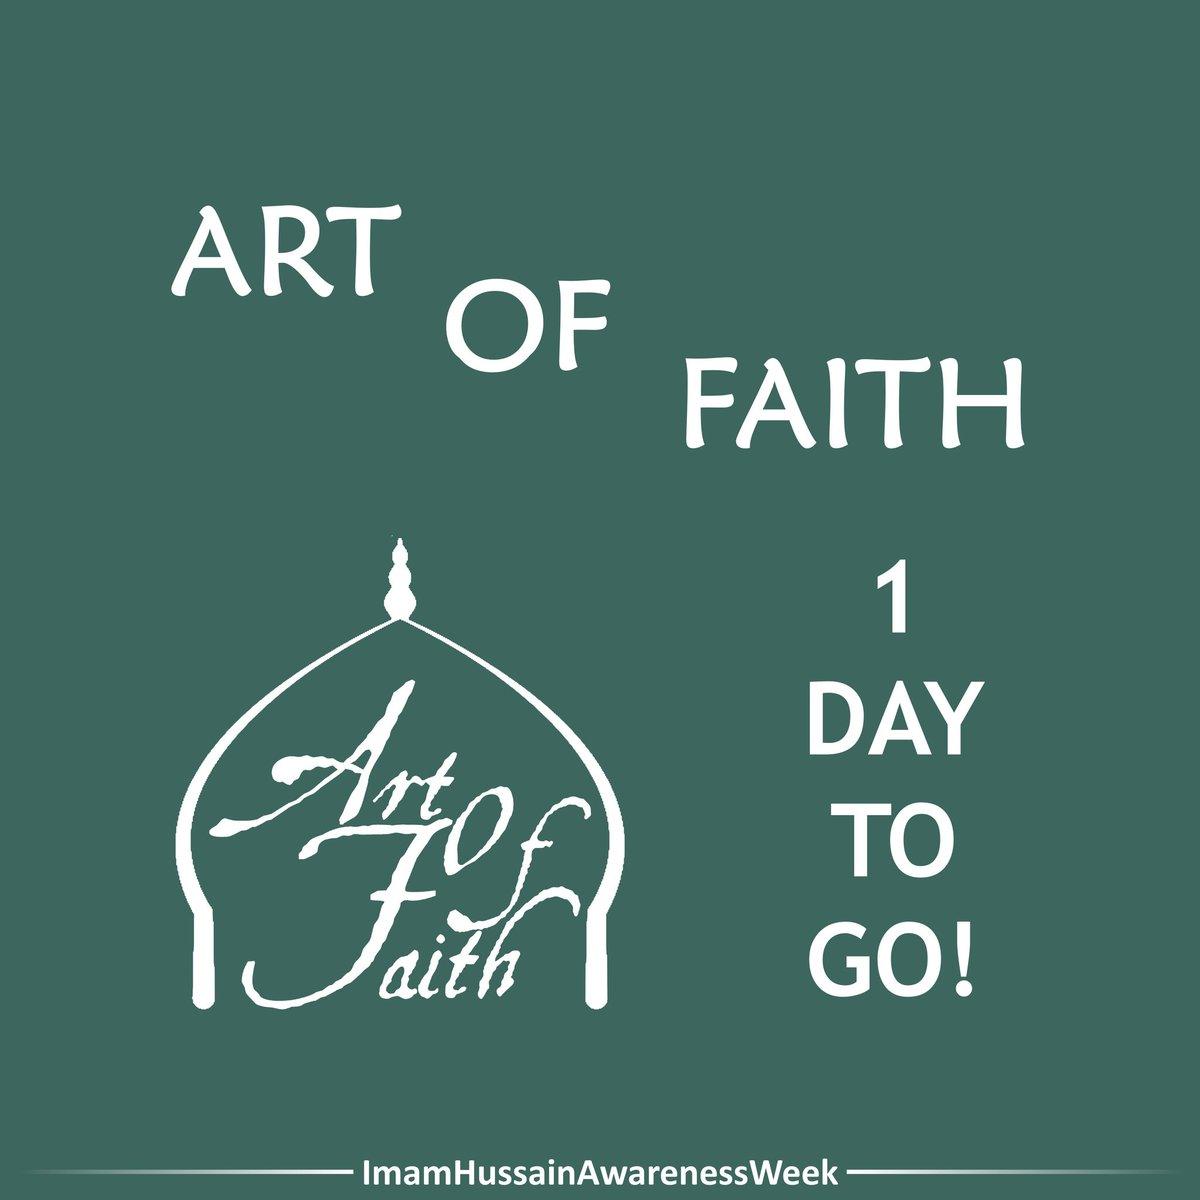 "A NOT to miss event is coming ""ART OF FAITH""  When? Tomorrow Where? ICE, (W9 1QB) Time? 6:30pm (main event) Exhibition? 5:30 - 9pm  Speakers/recitors? •Sheikh Bahmanpour •Sayed Zaigham Ali Shan •Reza John Vedadi •Sajjid Alidina •Amir Hossein Noori •Abbas Husain  #ArtOfFaith"